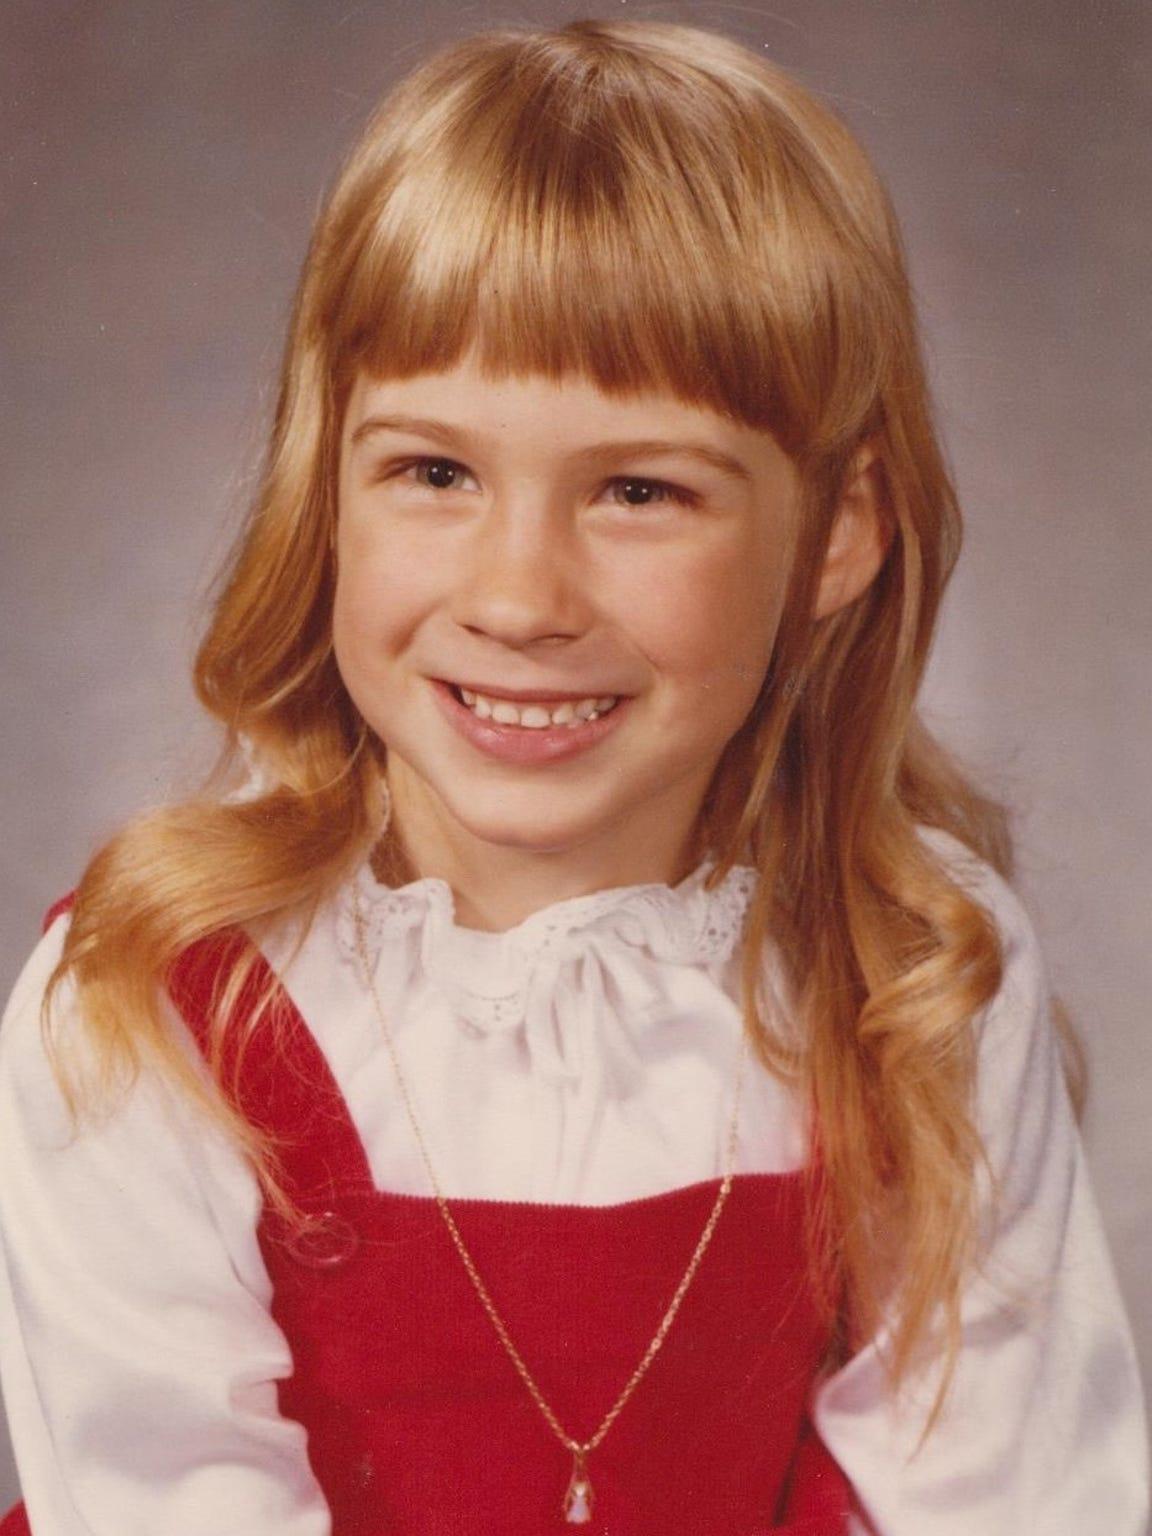 Heidi Wolfe in roughly sixth grade.